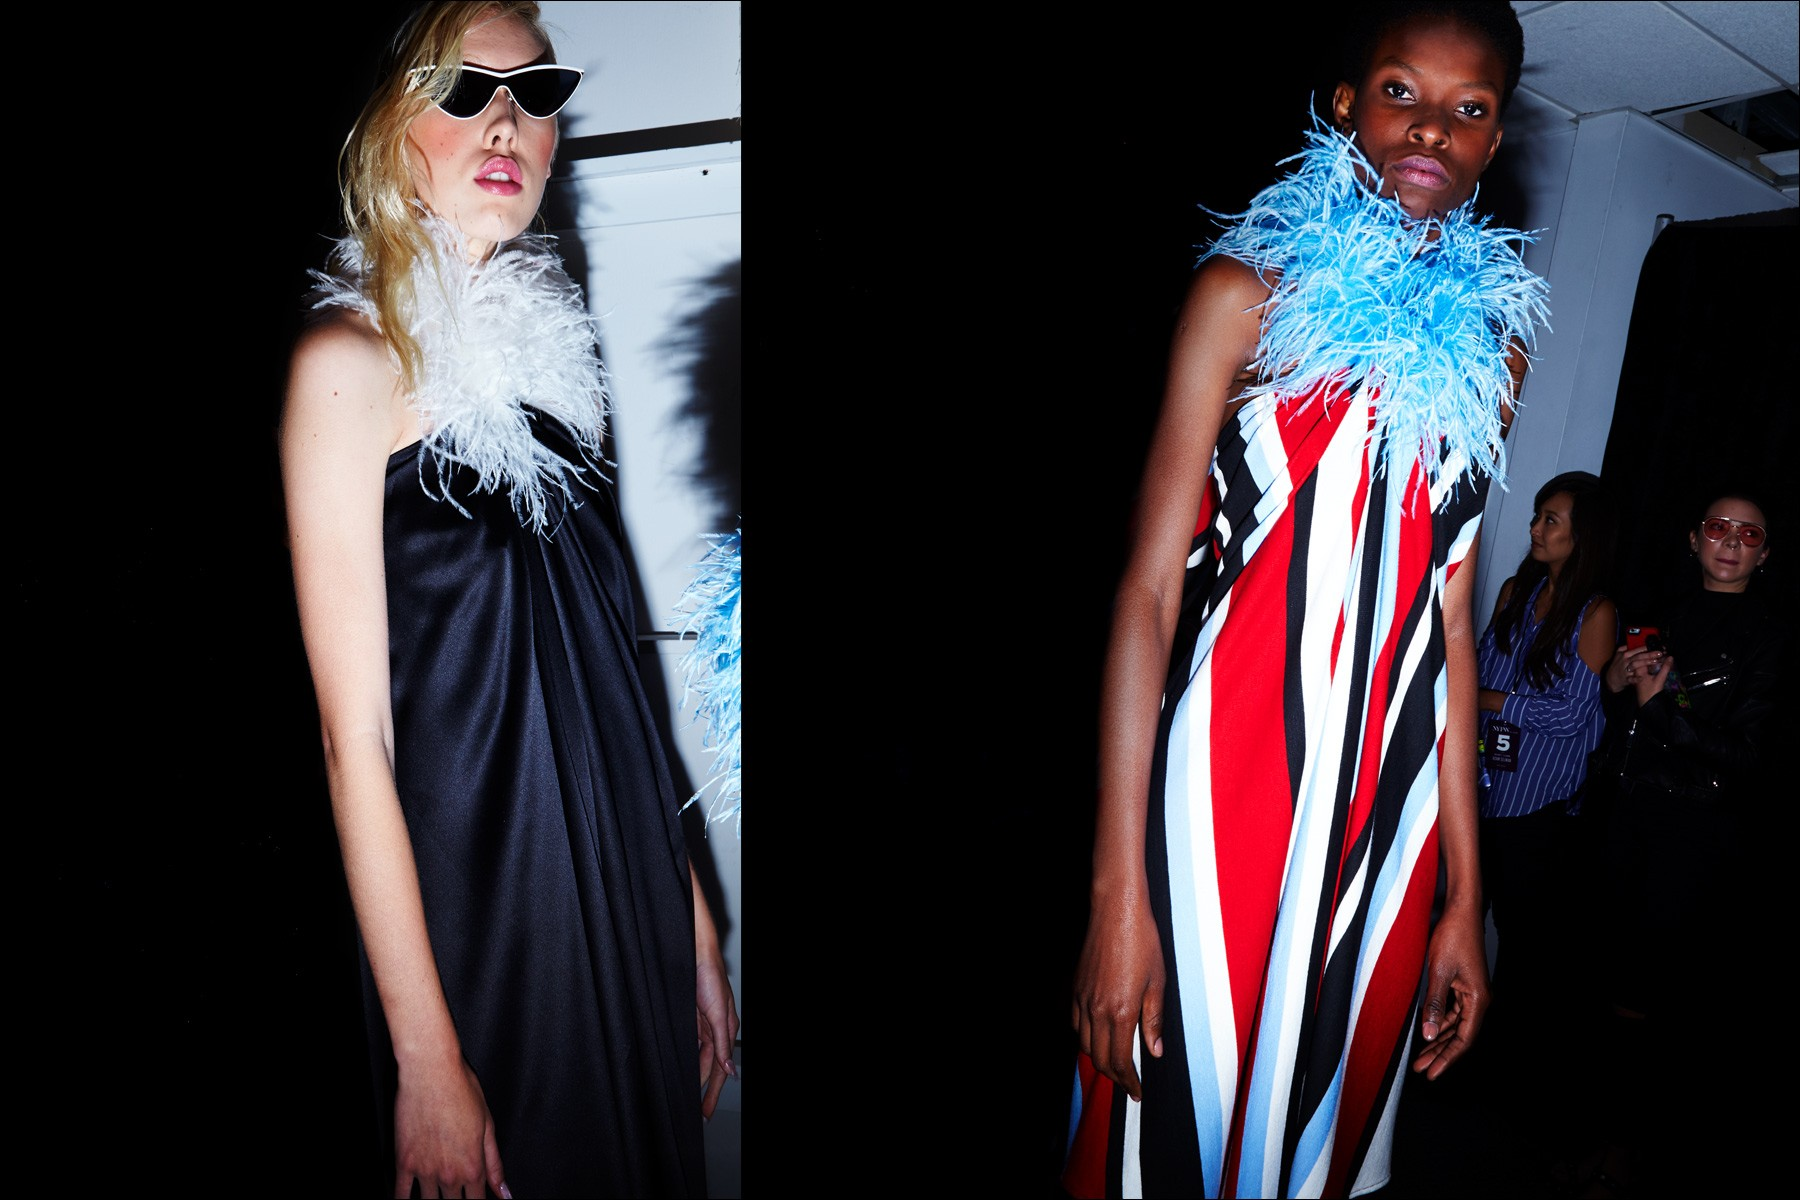 Models Tyg Davison & Barbra-Lee Grant photographed backstage before walking at Adam Selman S/S 2018 womenswear show. Photography by Alexander Thompson for Ponyboy magazine New York.